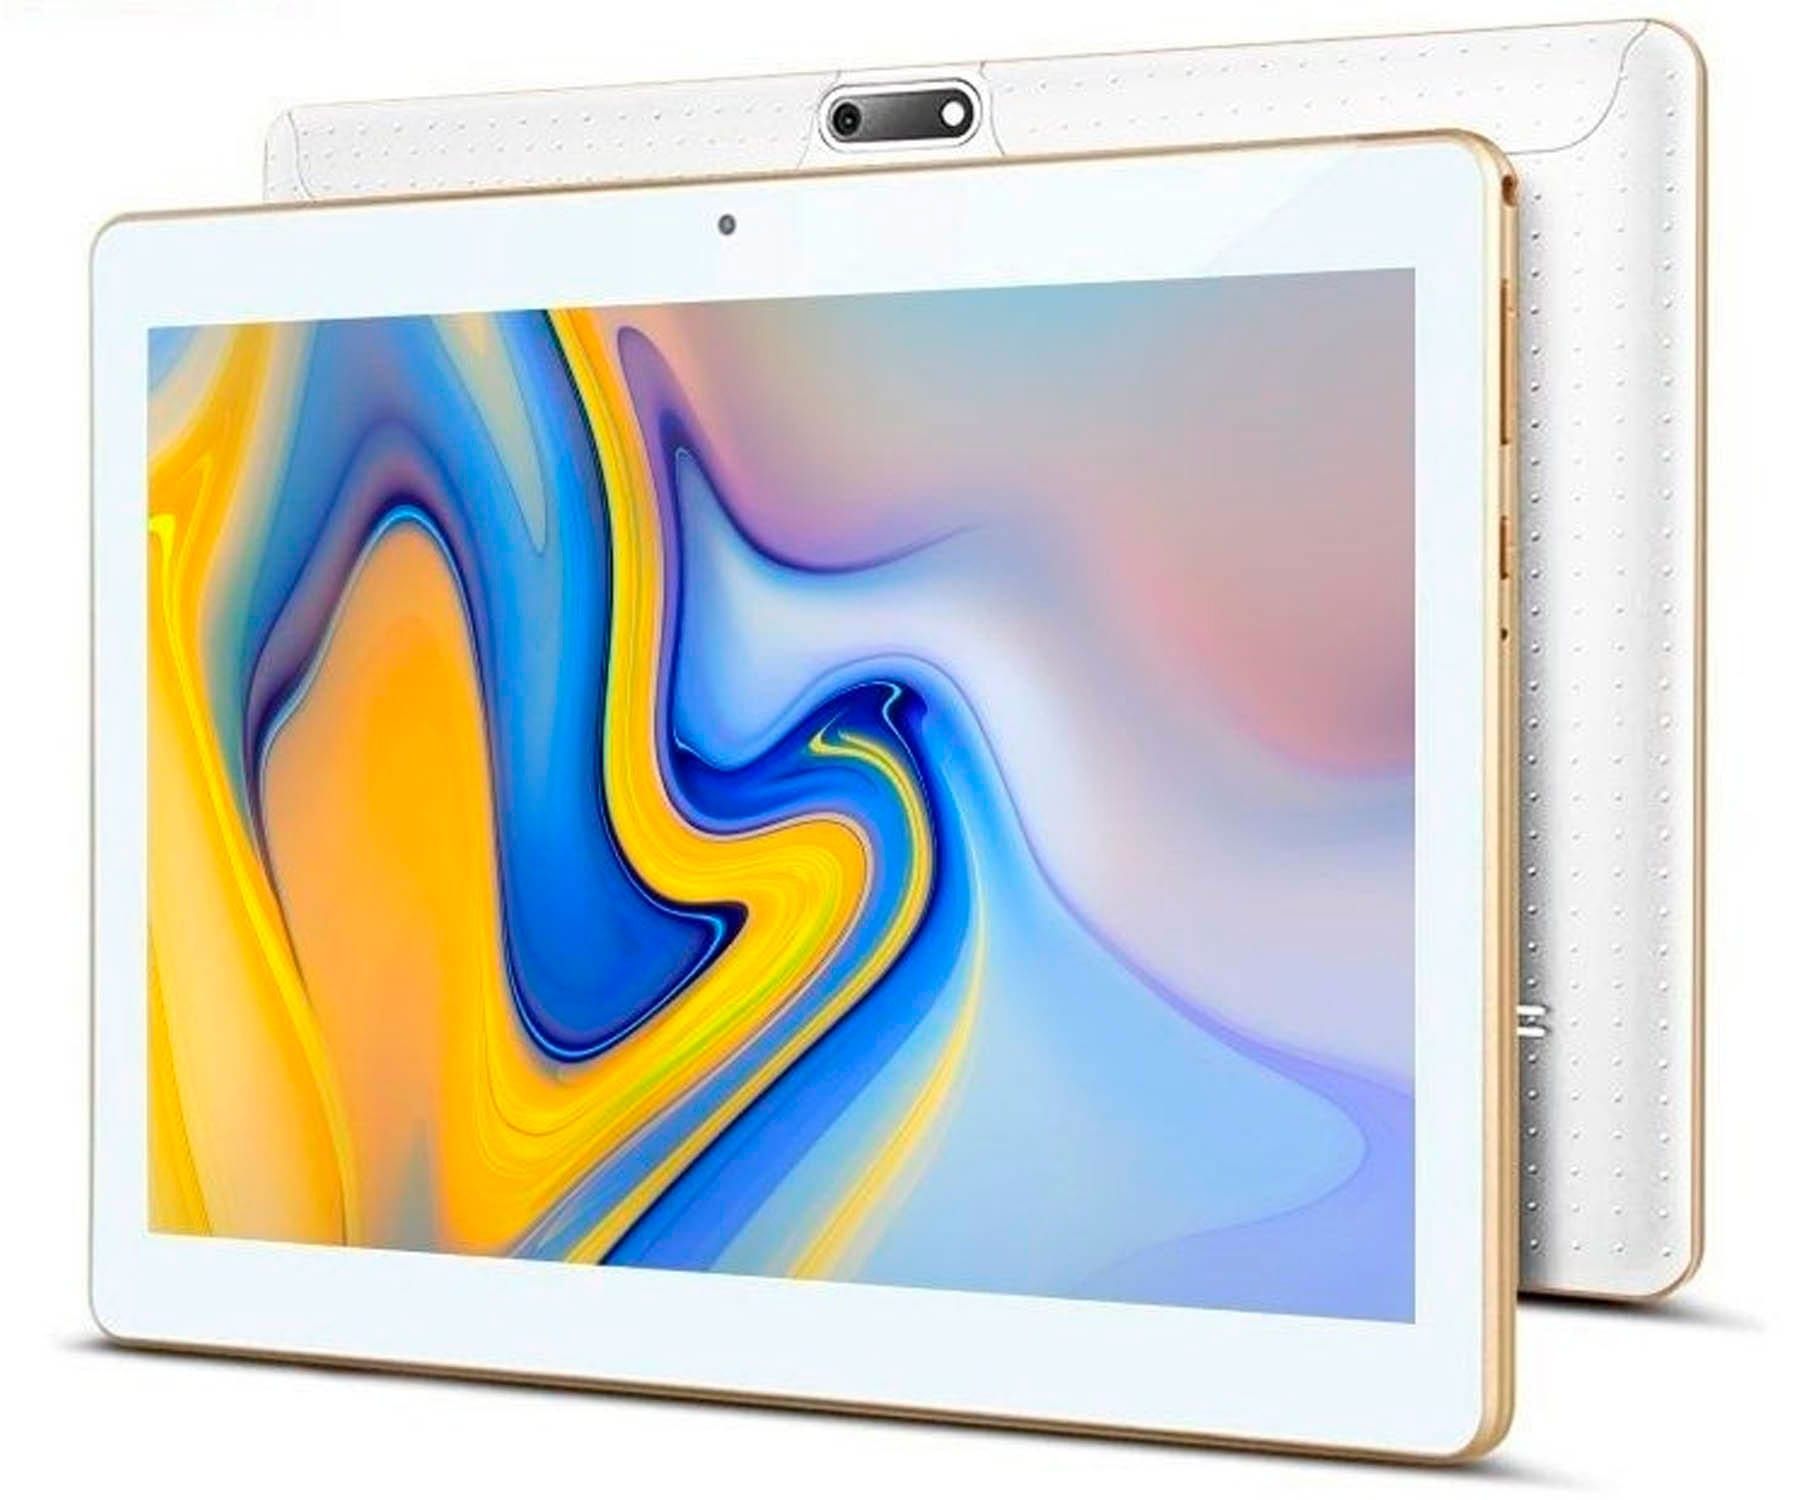 INNJOO SUPERB BLANCO TABLET 3G SIM 10.1'' IPS QUADCORE 32GB 2GB RAM CAM 2MP SELFIES 0.3MP